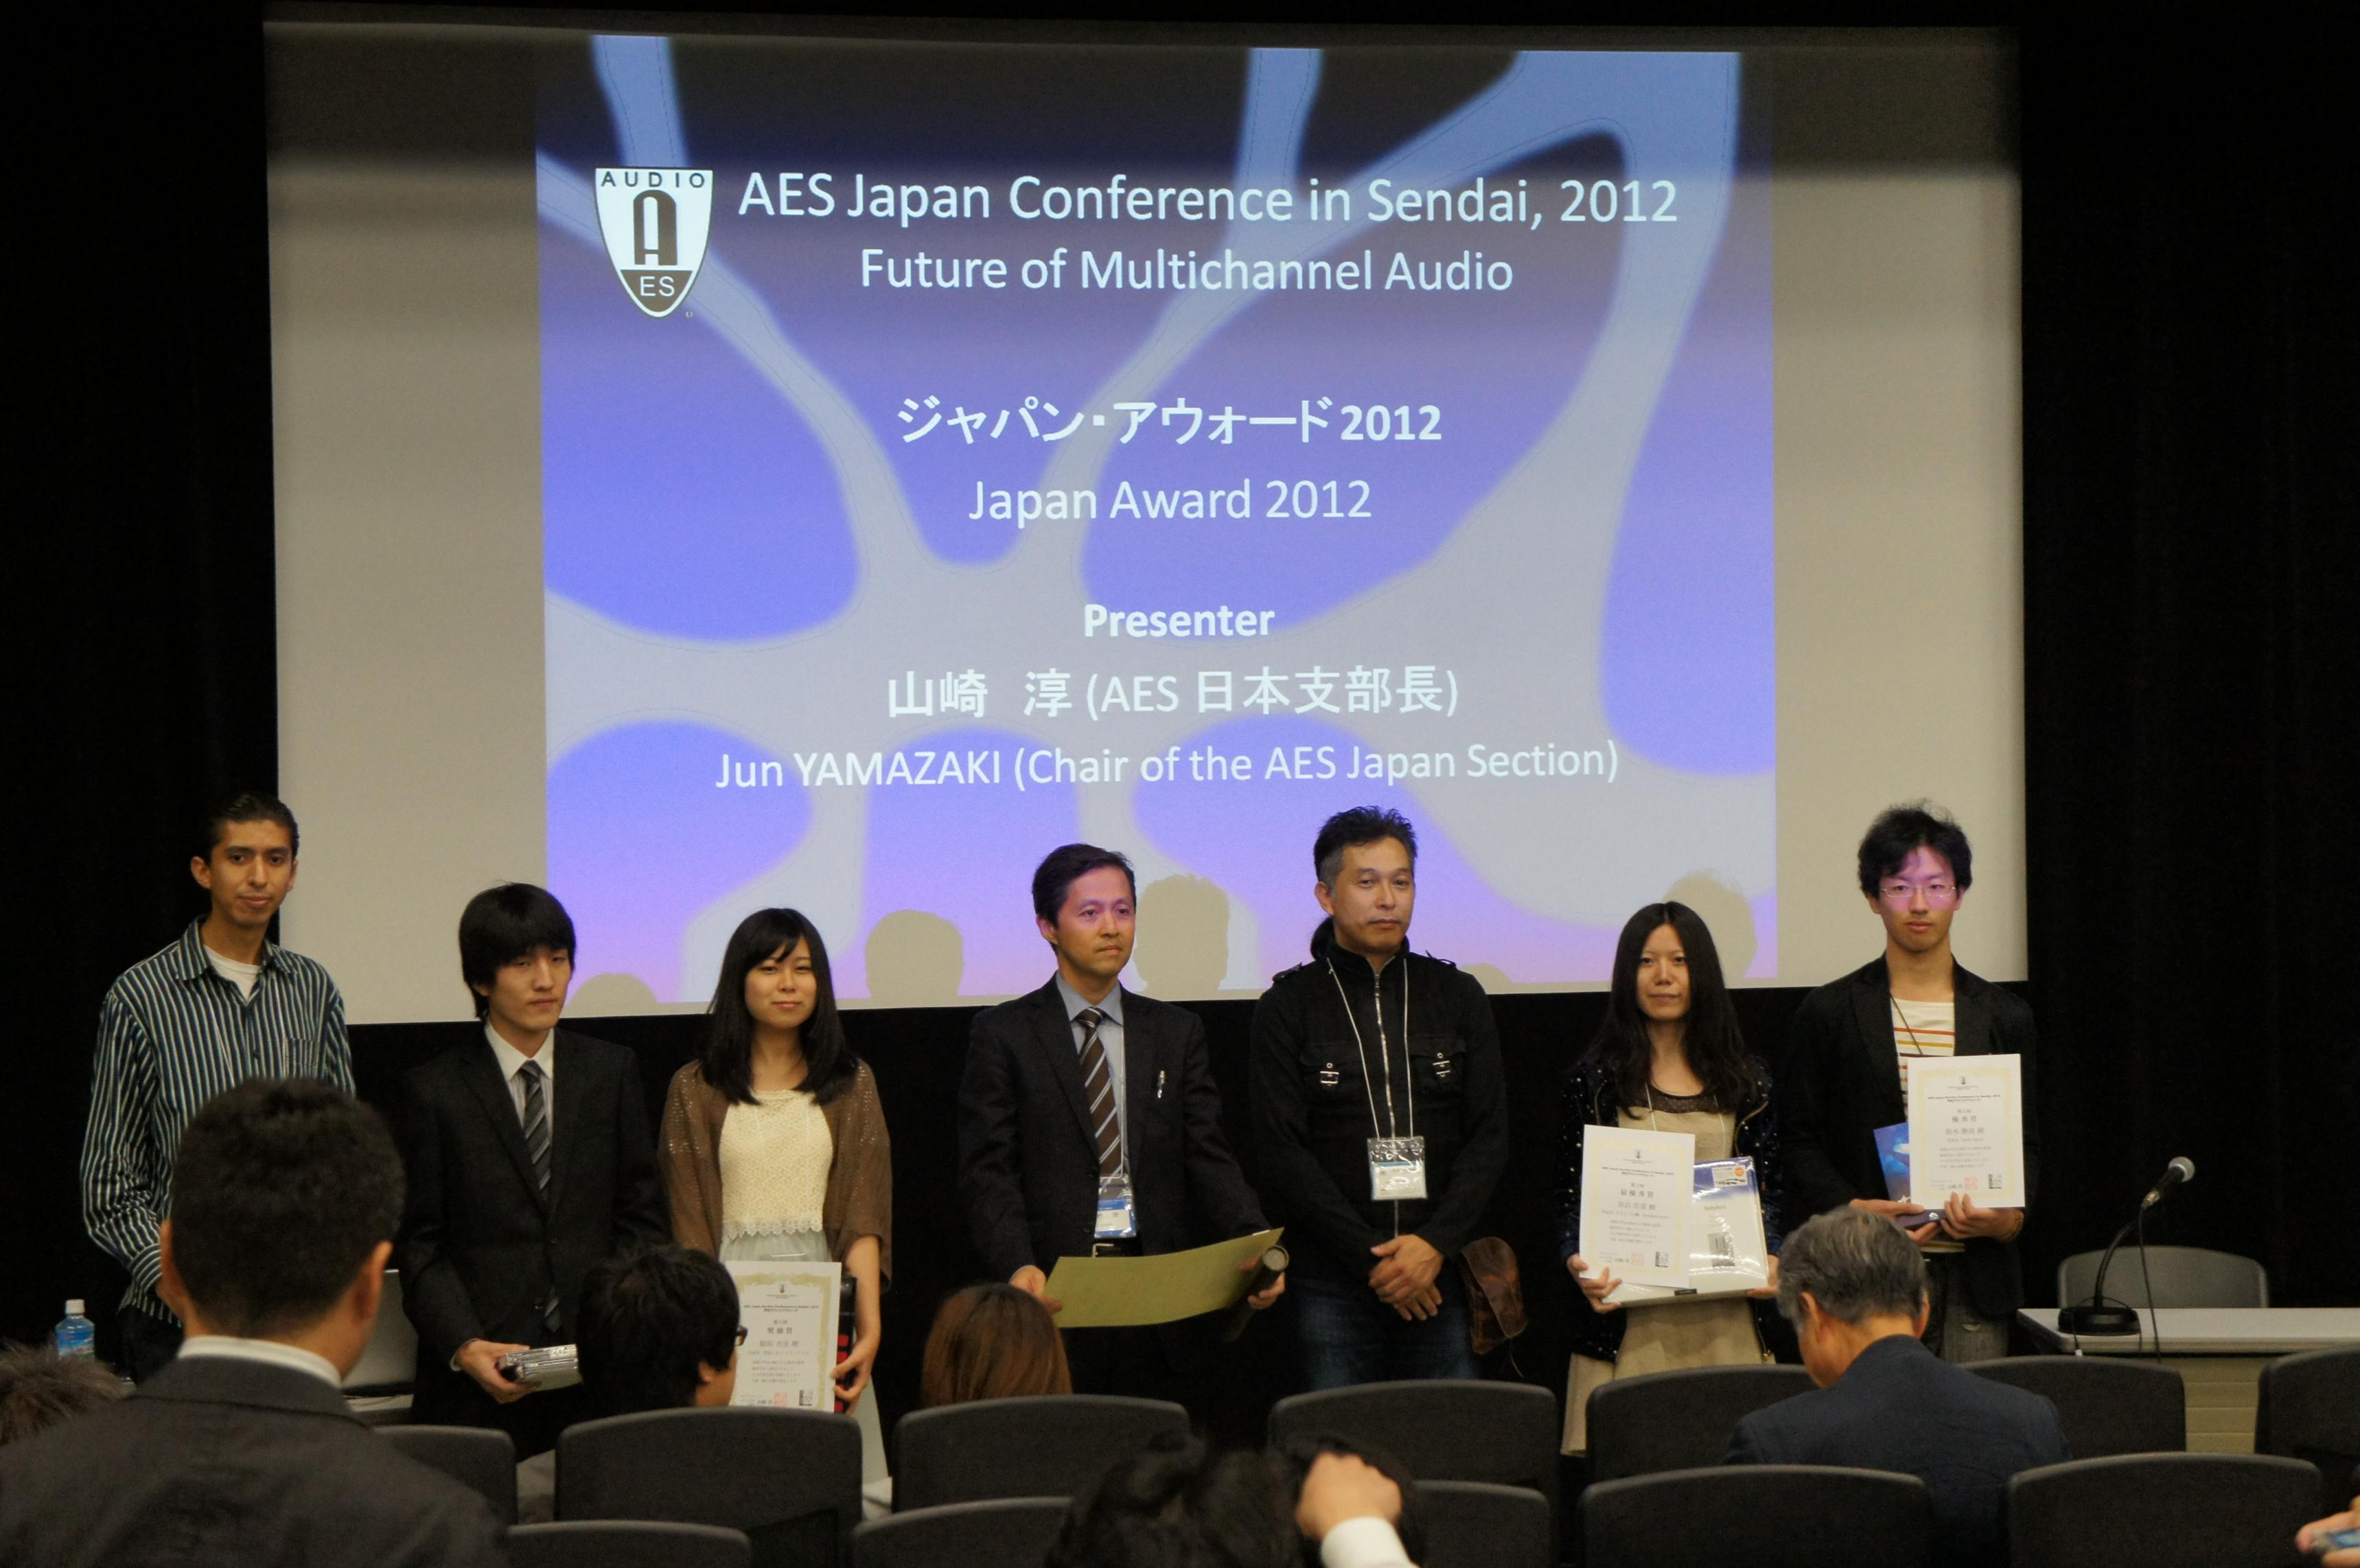 AESジャパンコンファレンス・仙台2012「サウンドアウォード最終審査会」レポート